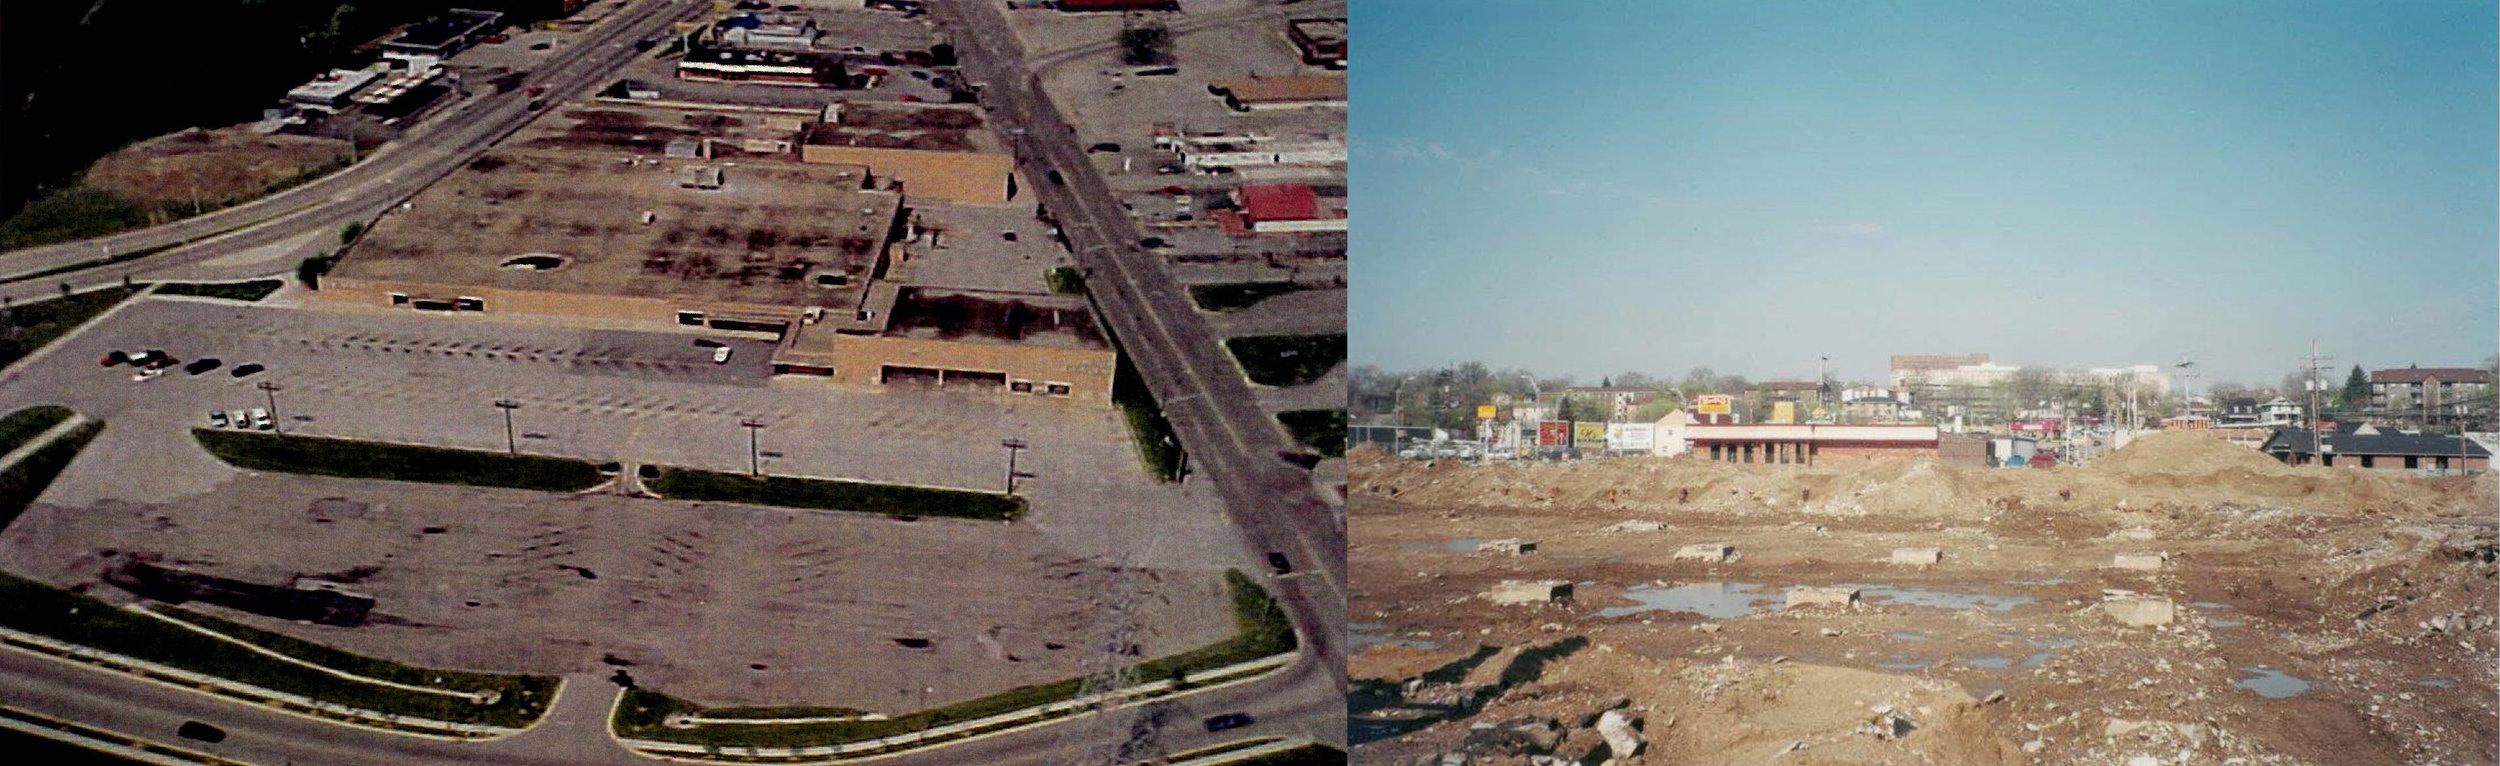 Wabash Landing Area - Before